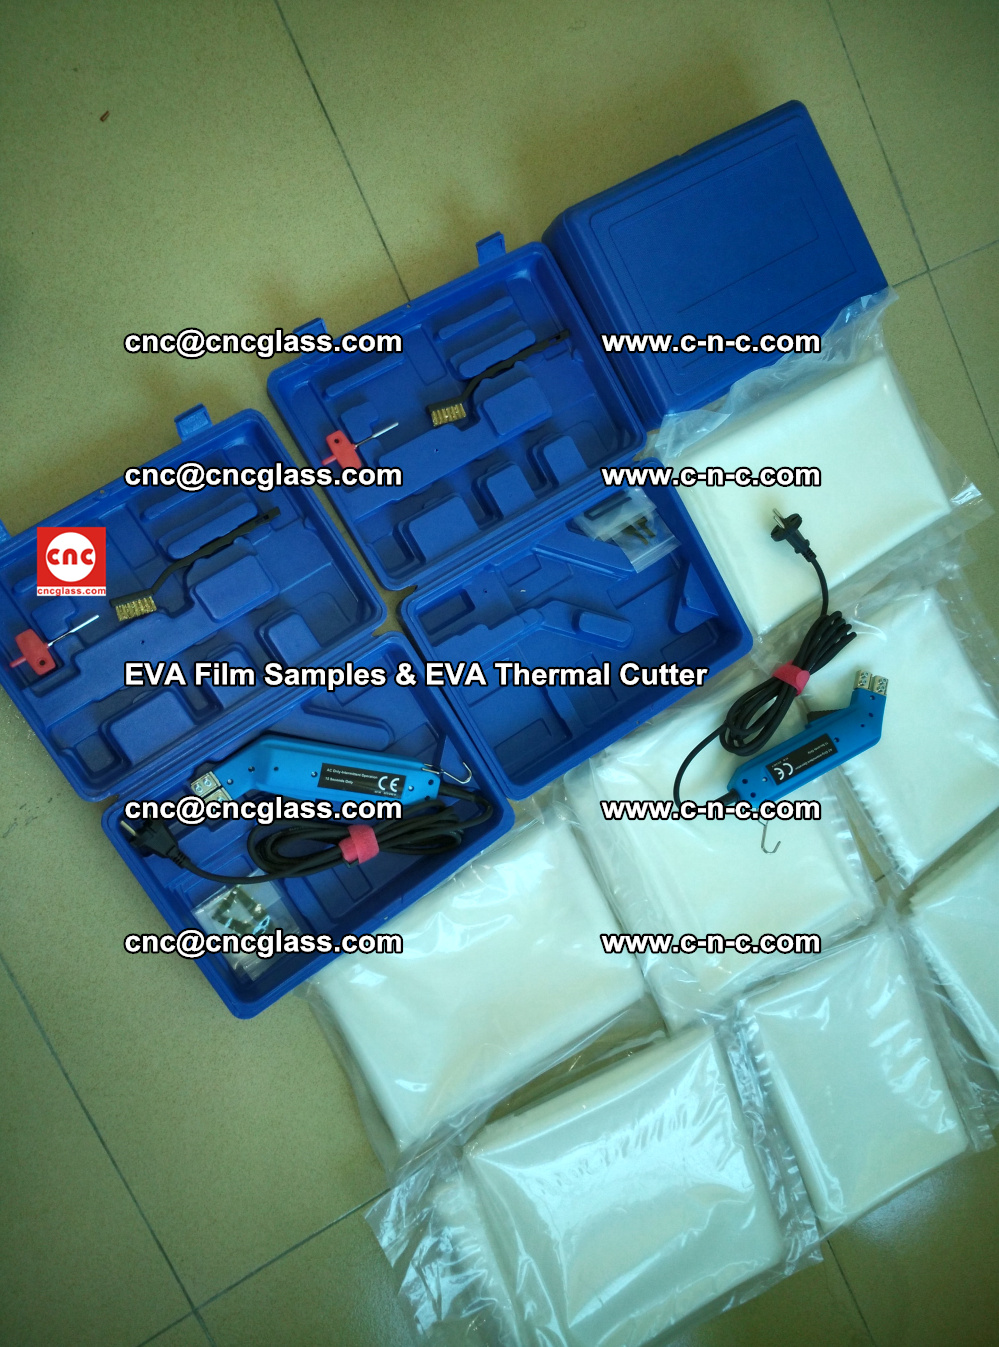 EVAFORCE SUPER CLEAR EVA Film Samples and EVA Thermal Cutter (17)